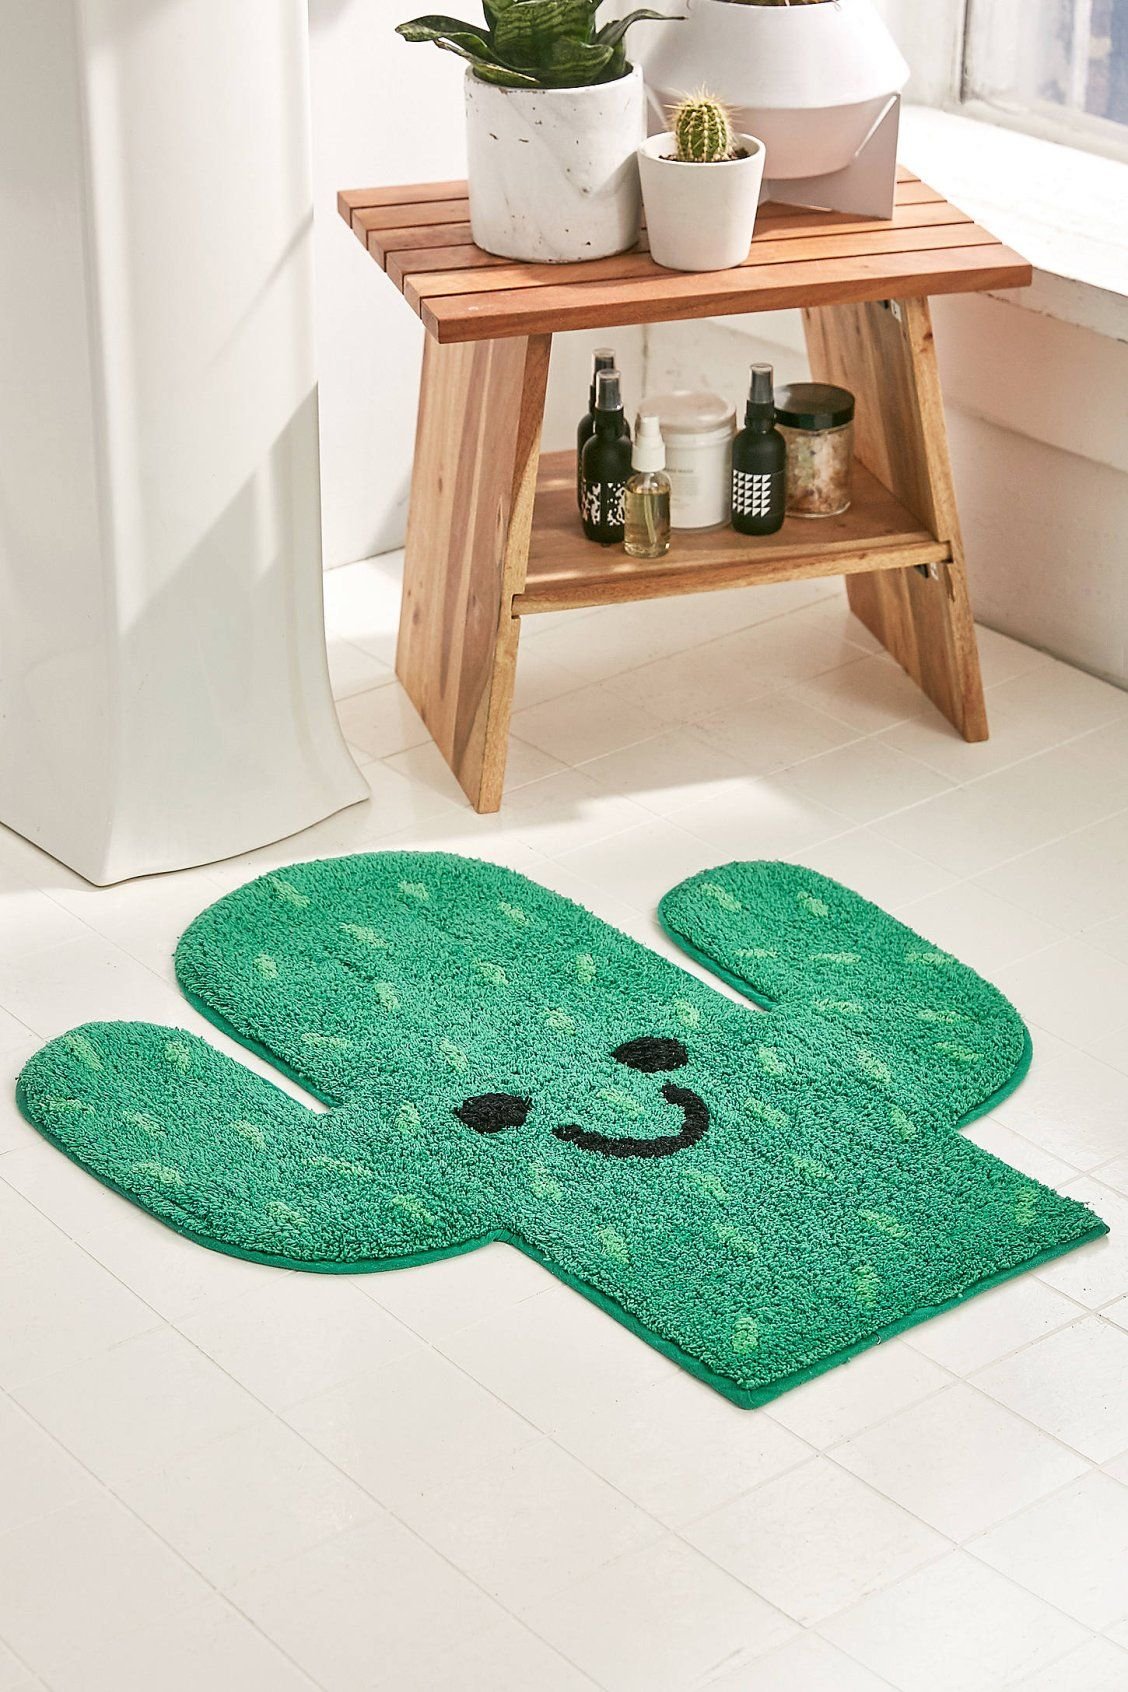 Cactus Bath Mat Home Design Decor Bathroom Themes Cactus Bedroom